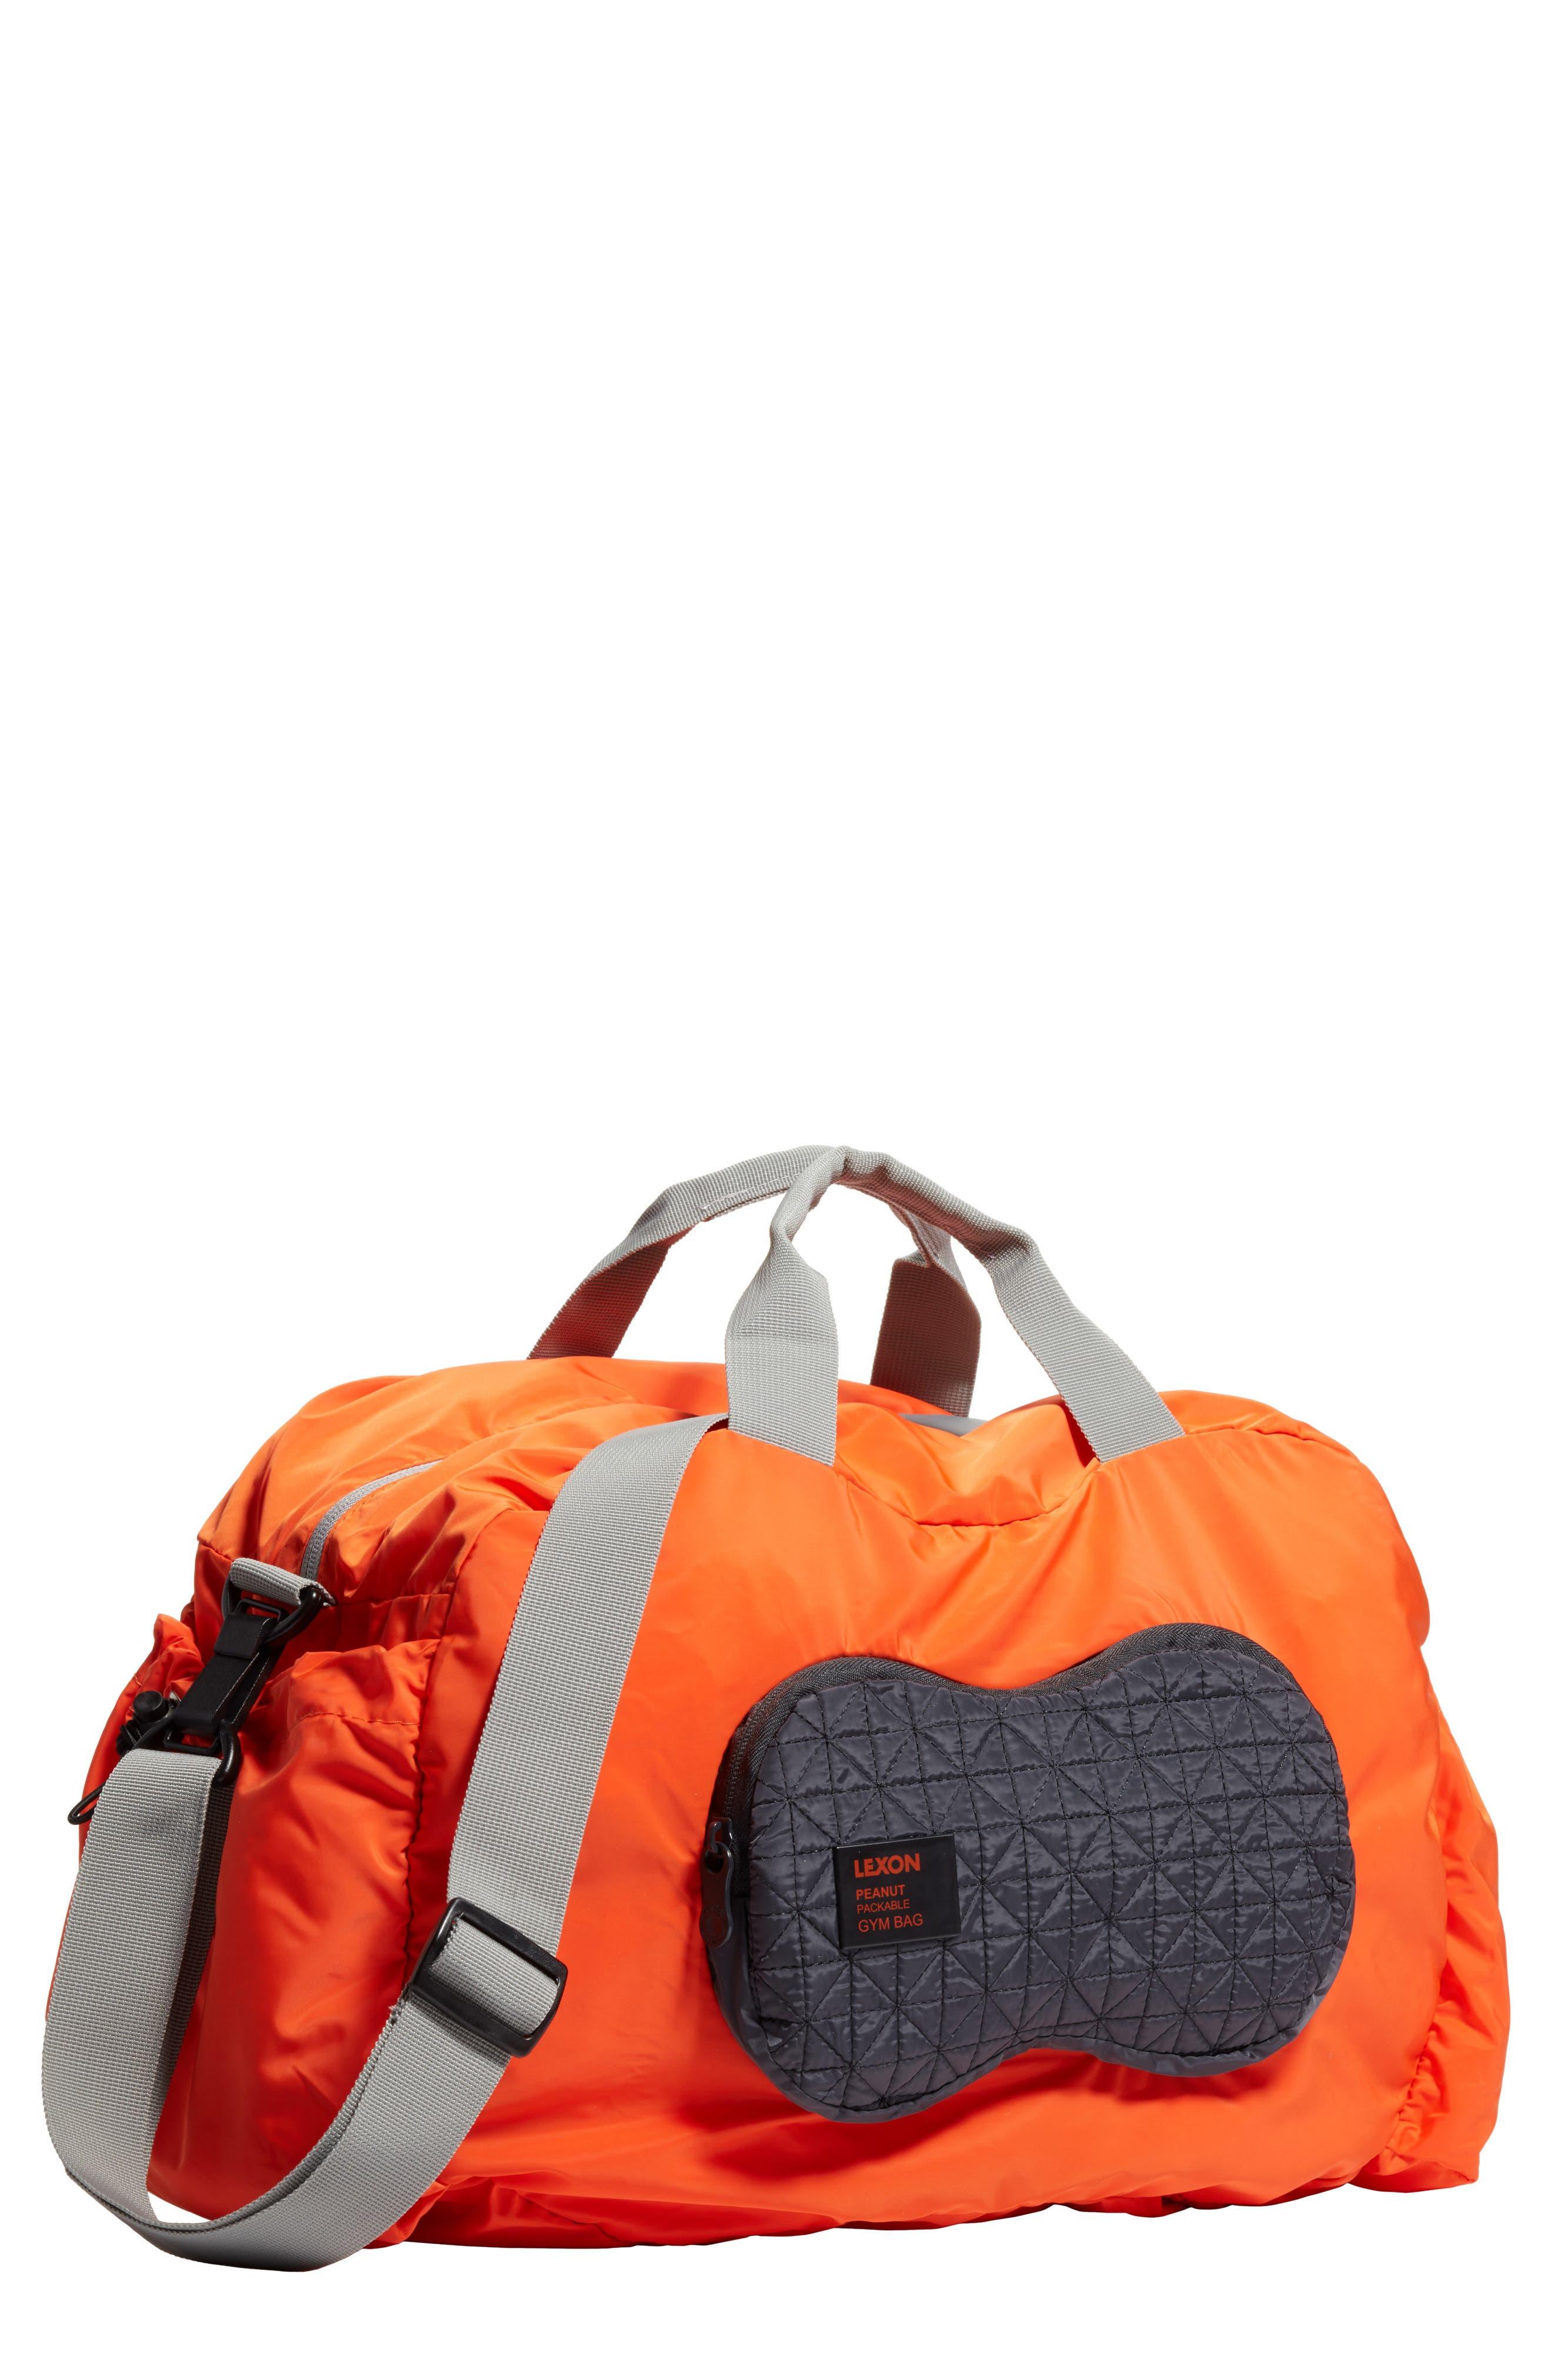 LEXON Packable Peanut Duffel Bag